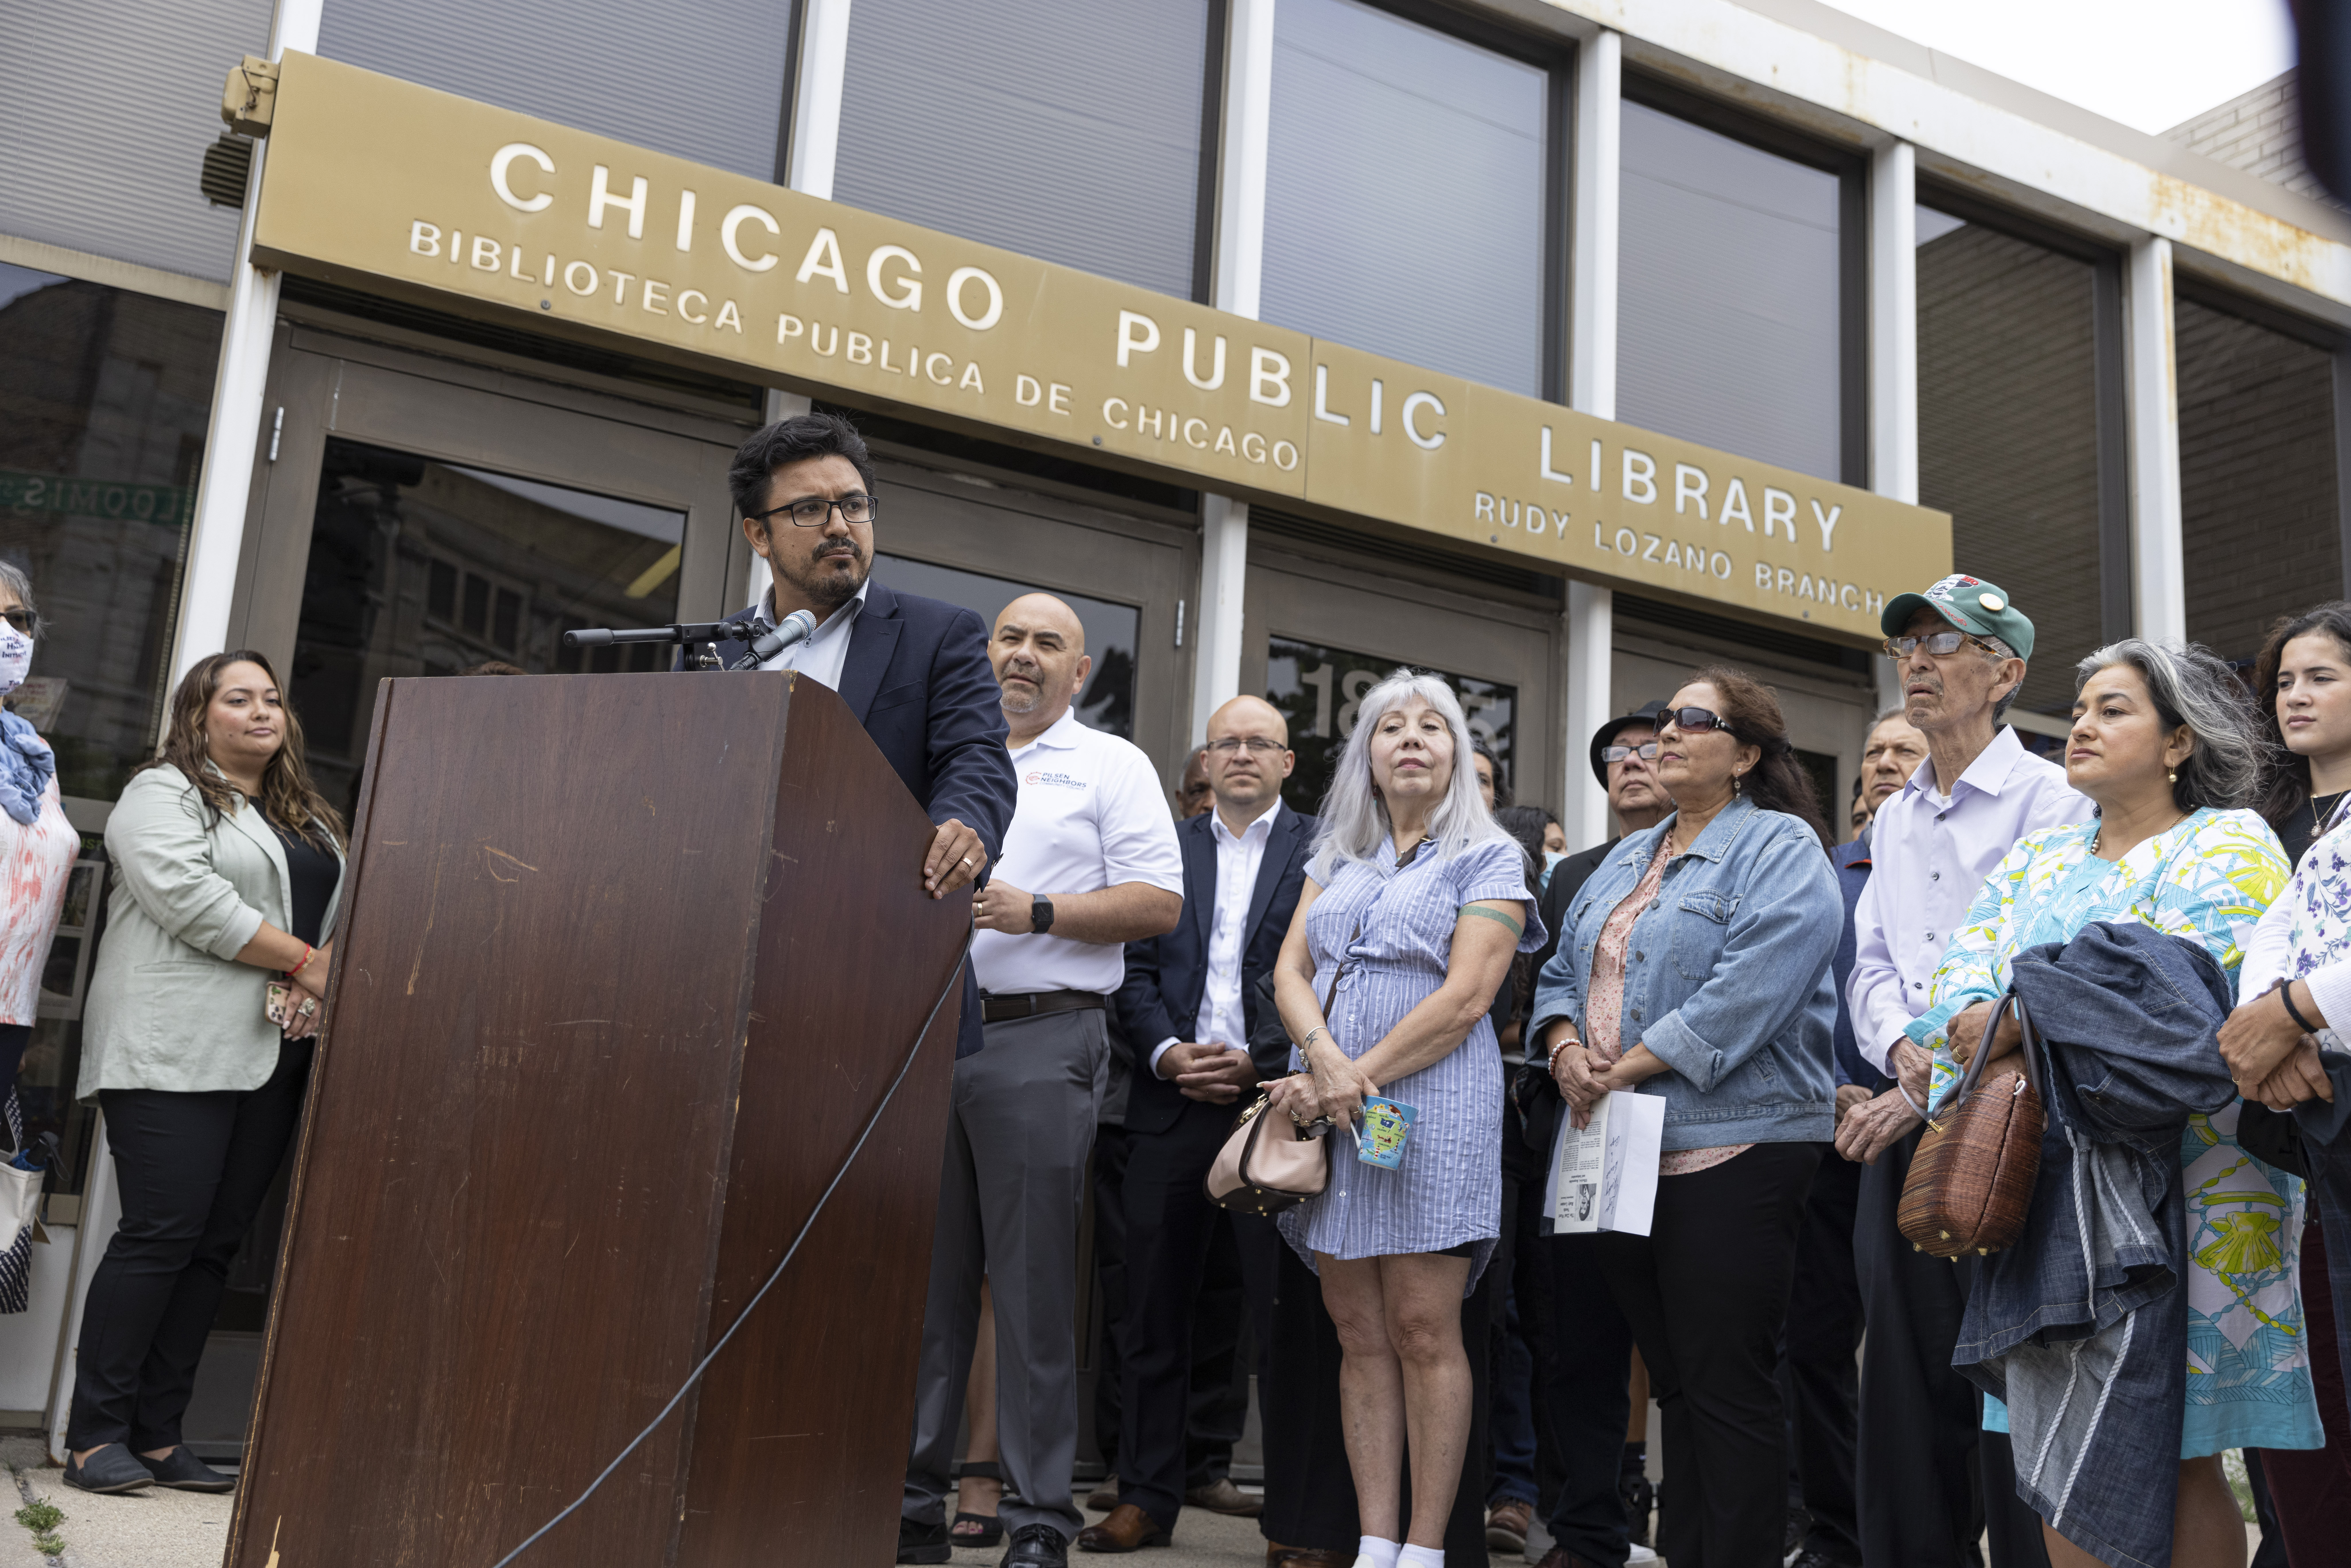 Rudy Lozano branch of the Chicago Public Library